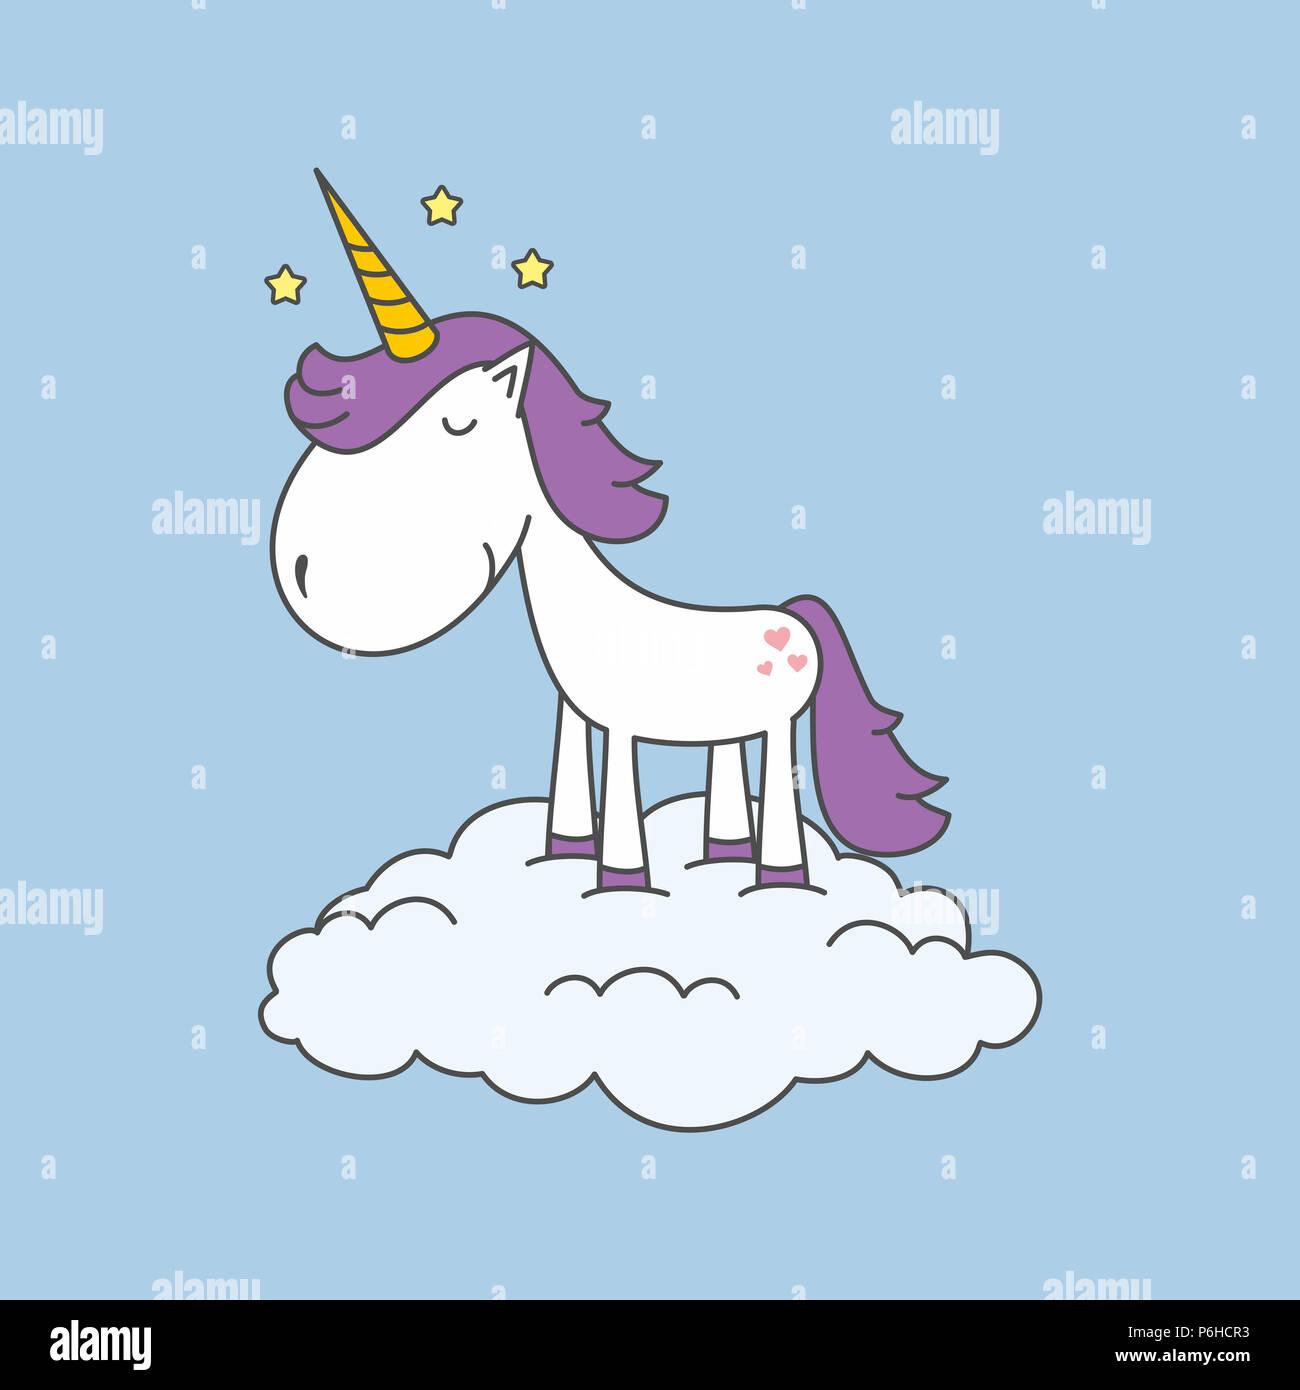 Very Cute Cartoon Unicorn Standing On A Cloud Lovely Illustration